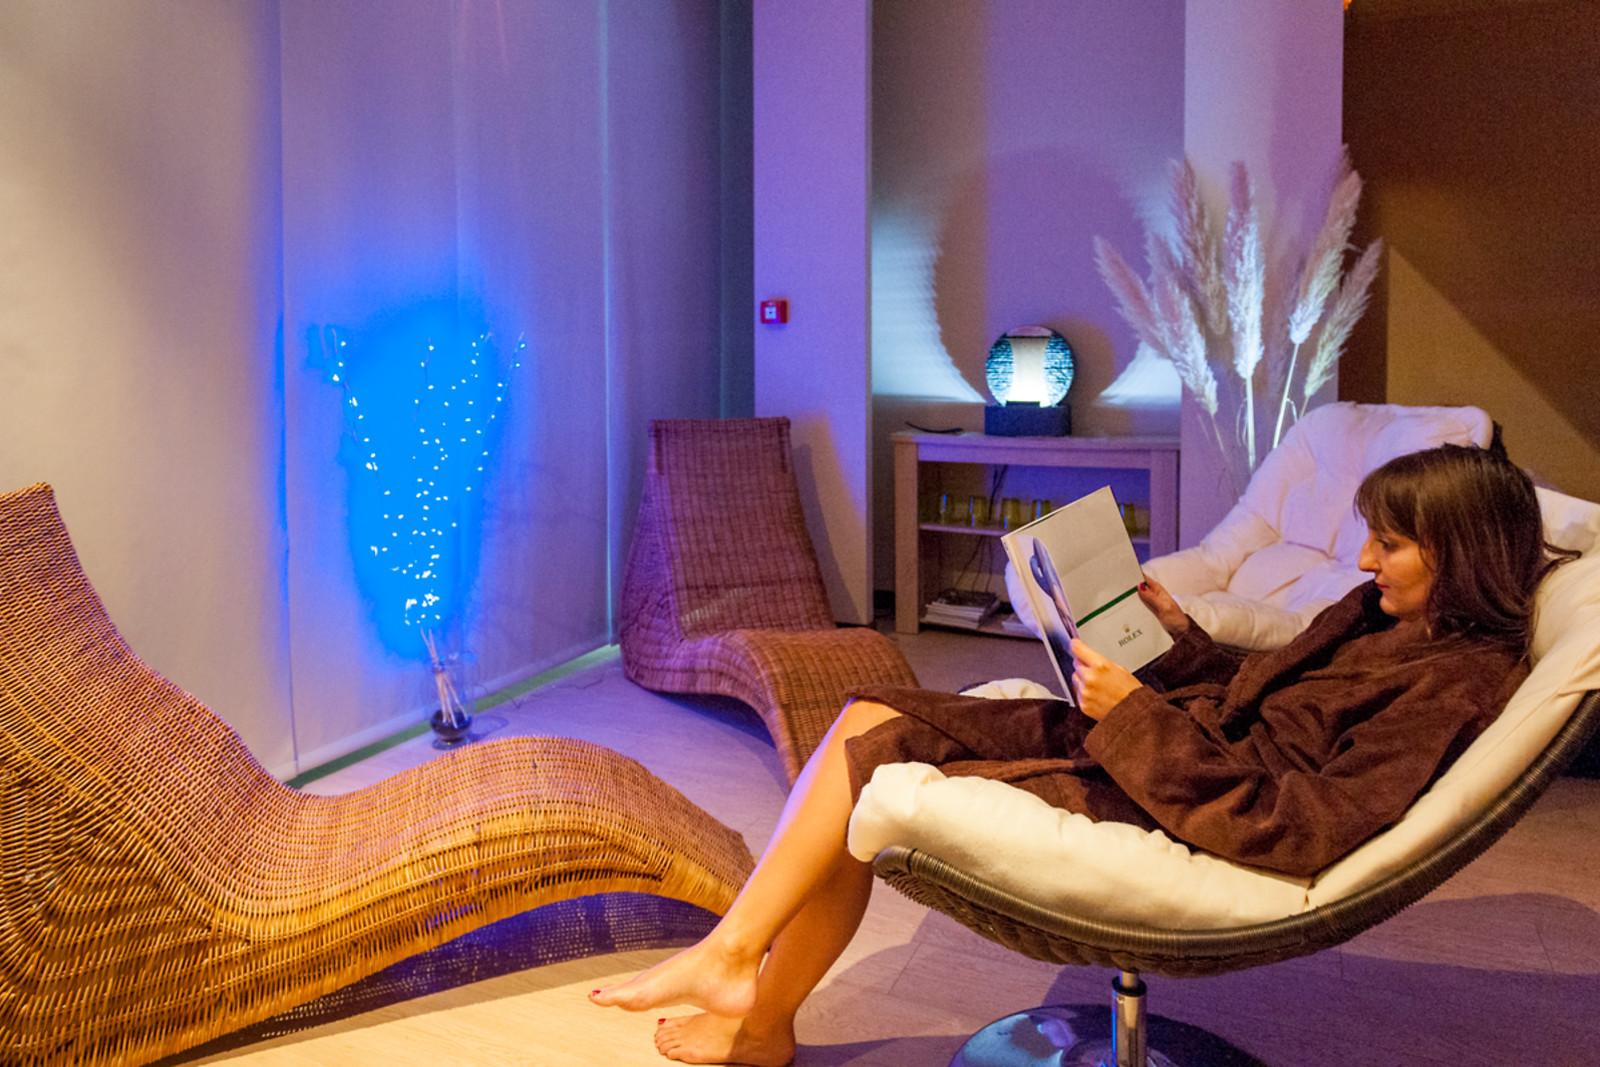 modelage et acc s au hammam chez torii spa montpellier 34 wonderbox. Black Bedroom Furniture Sets. Home Design Ideas